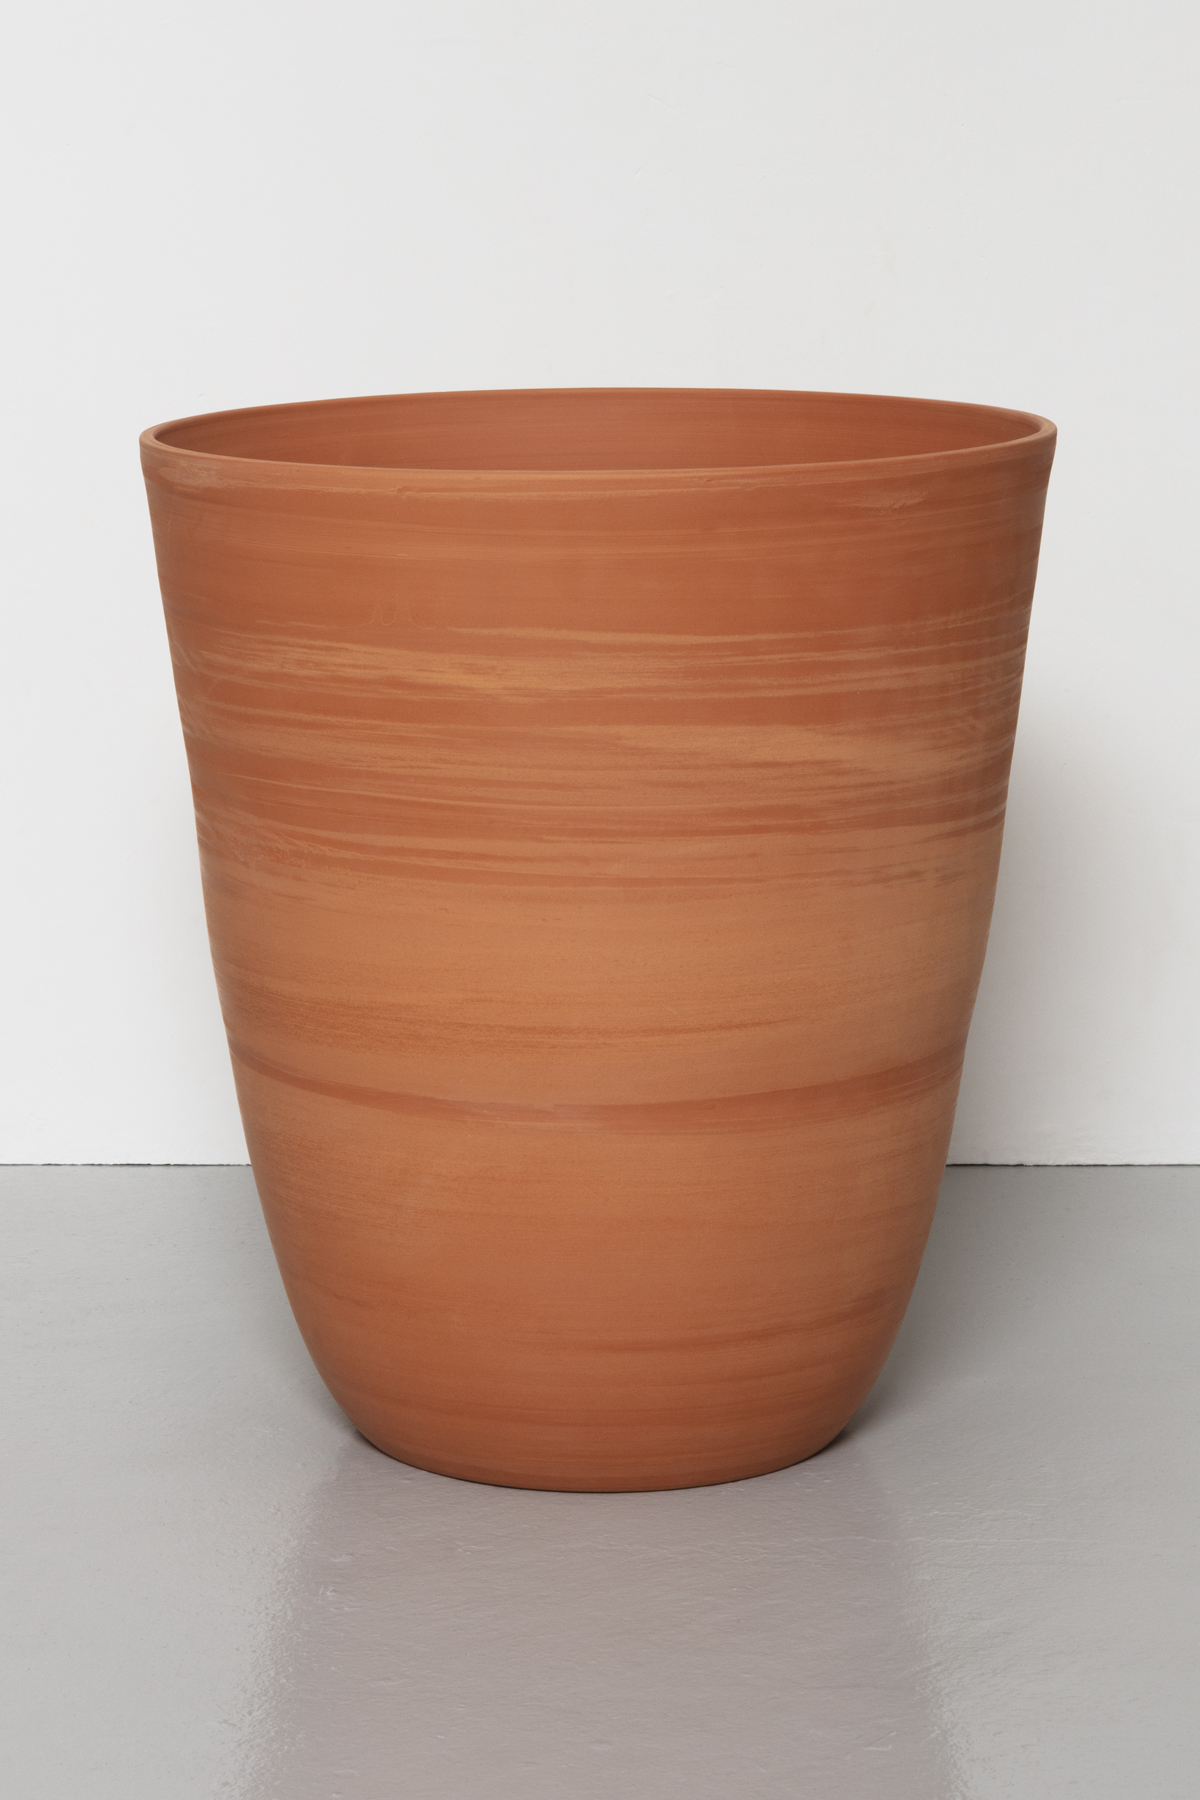 Kärl I  / Container I, 2020 Thrown earthenware 44,5 cm x 40,5 cm/diameter